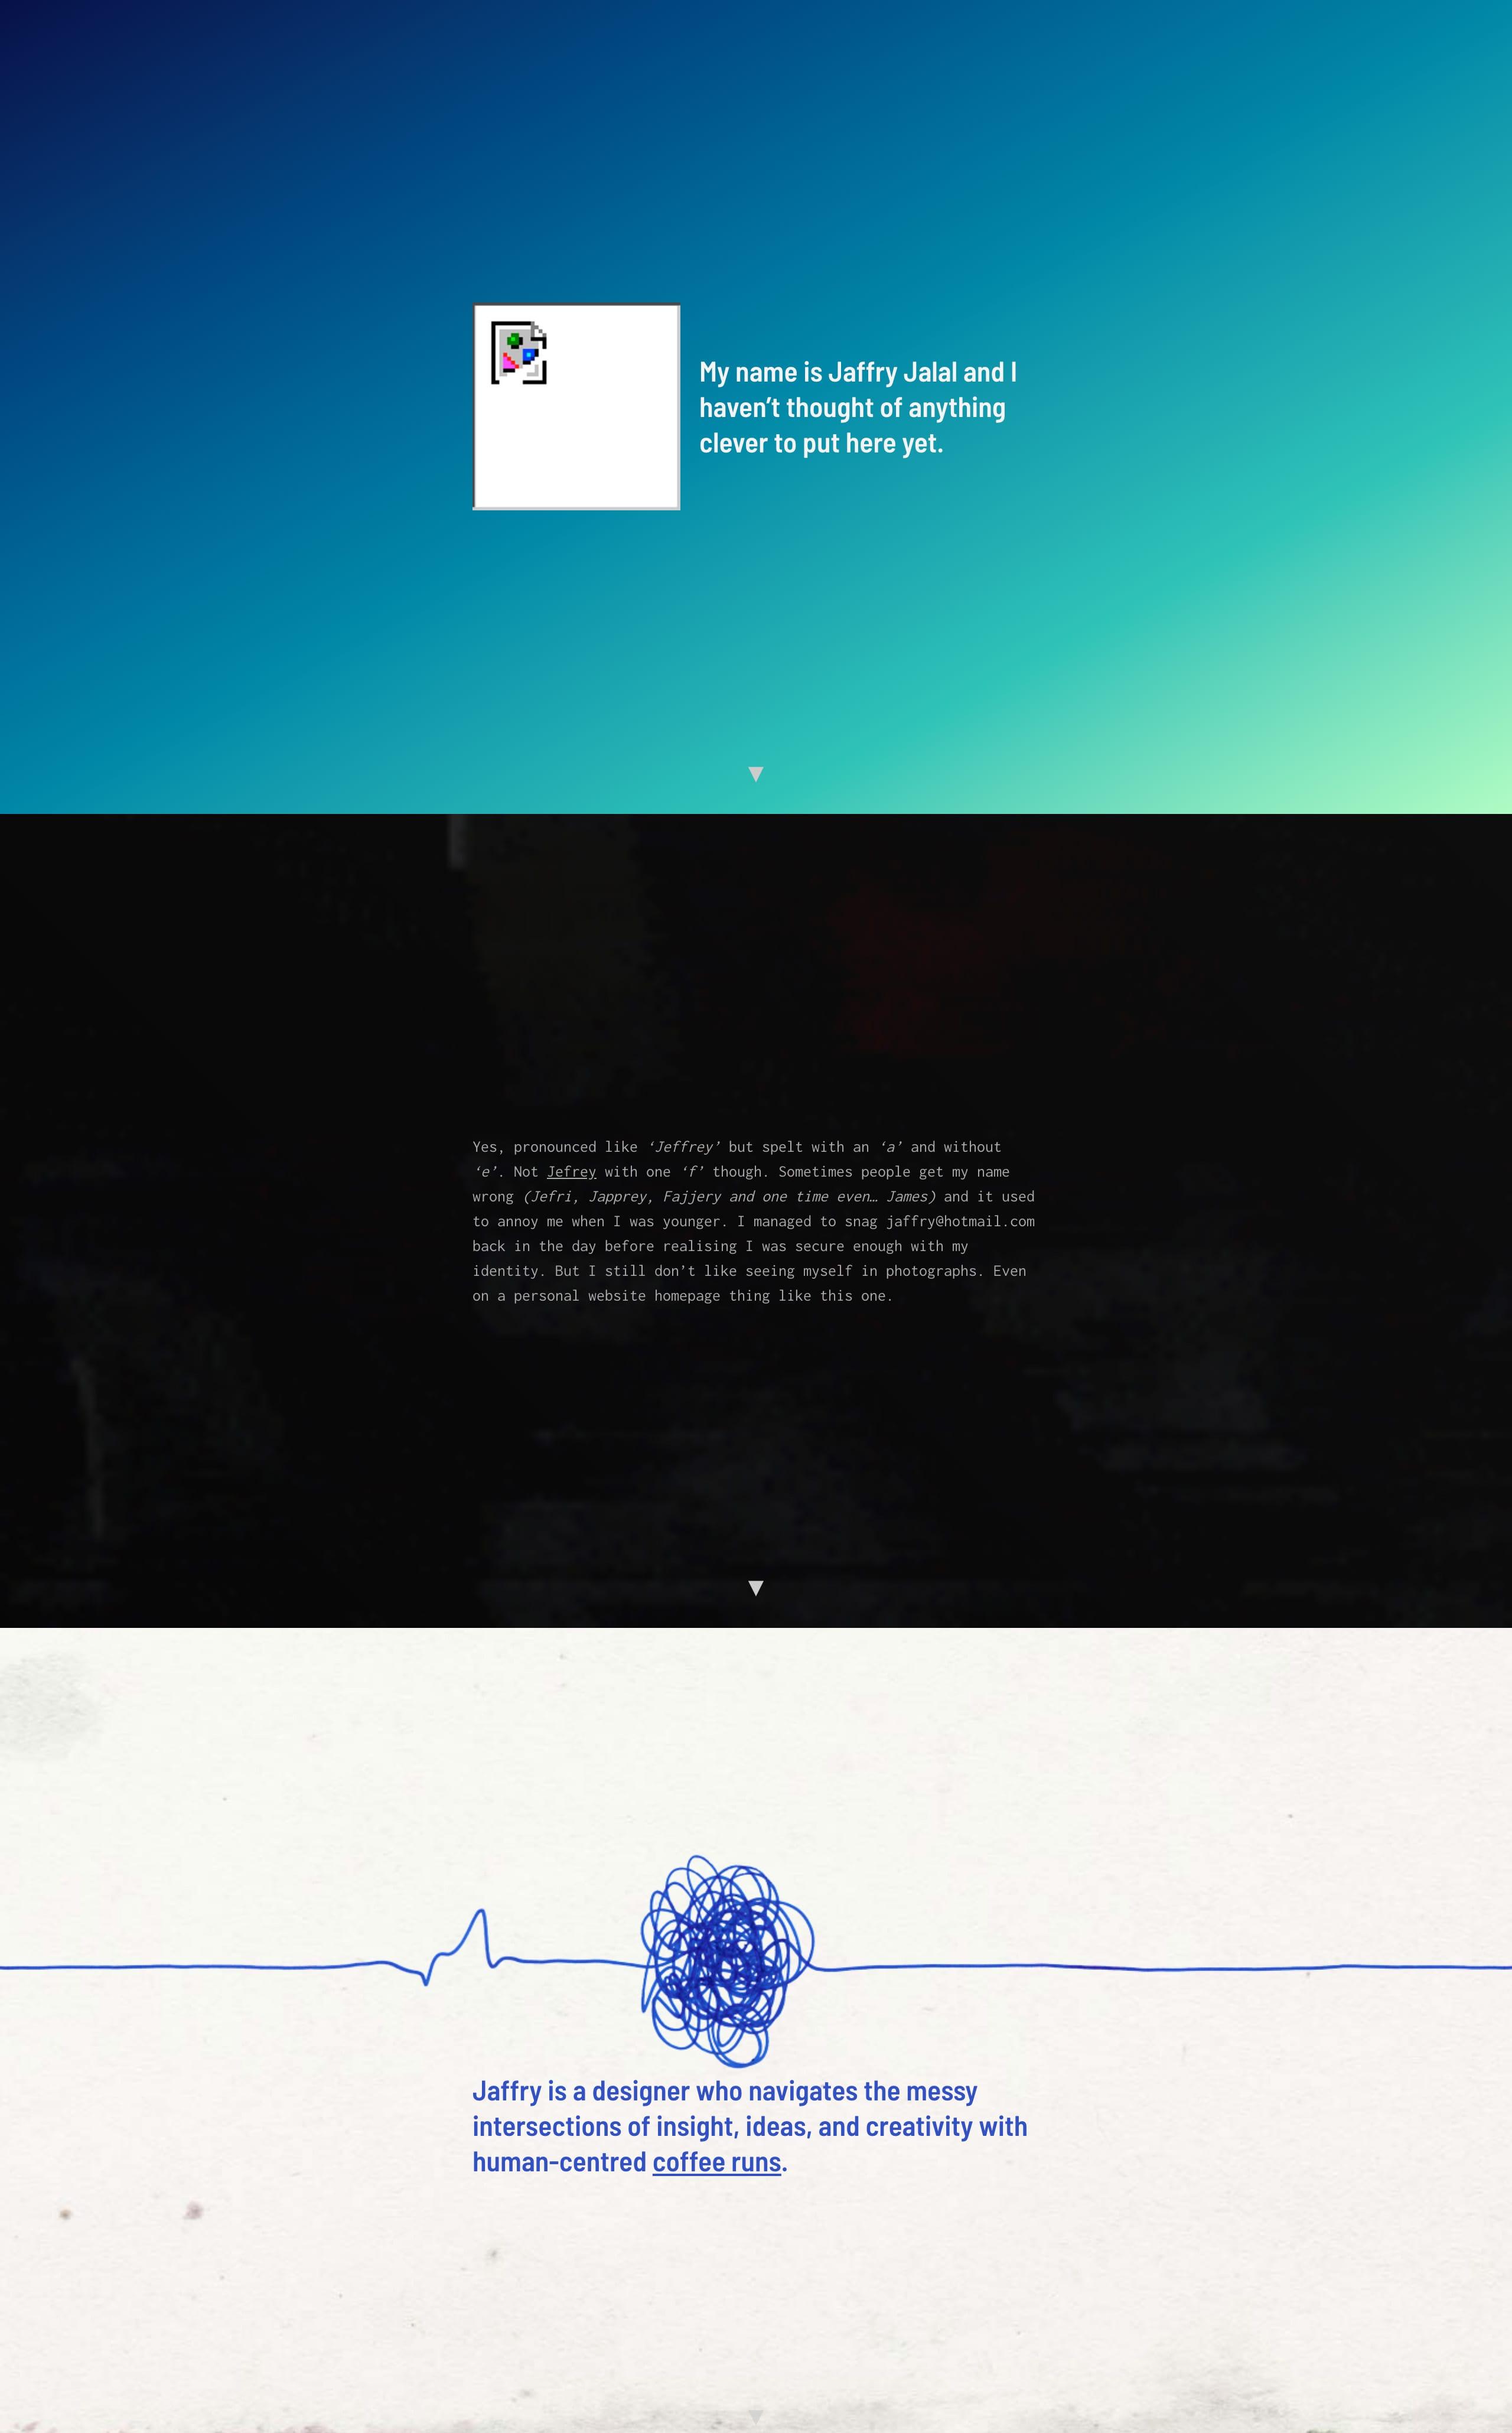 Jaffry Jalal Website Screenshot